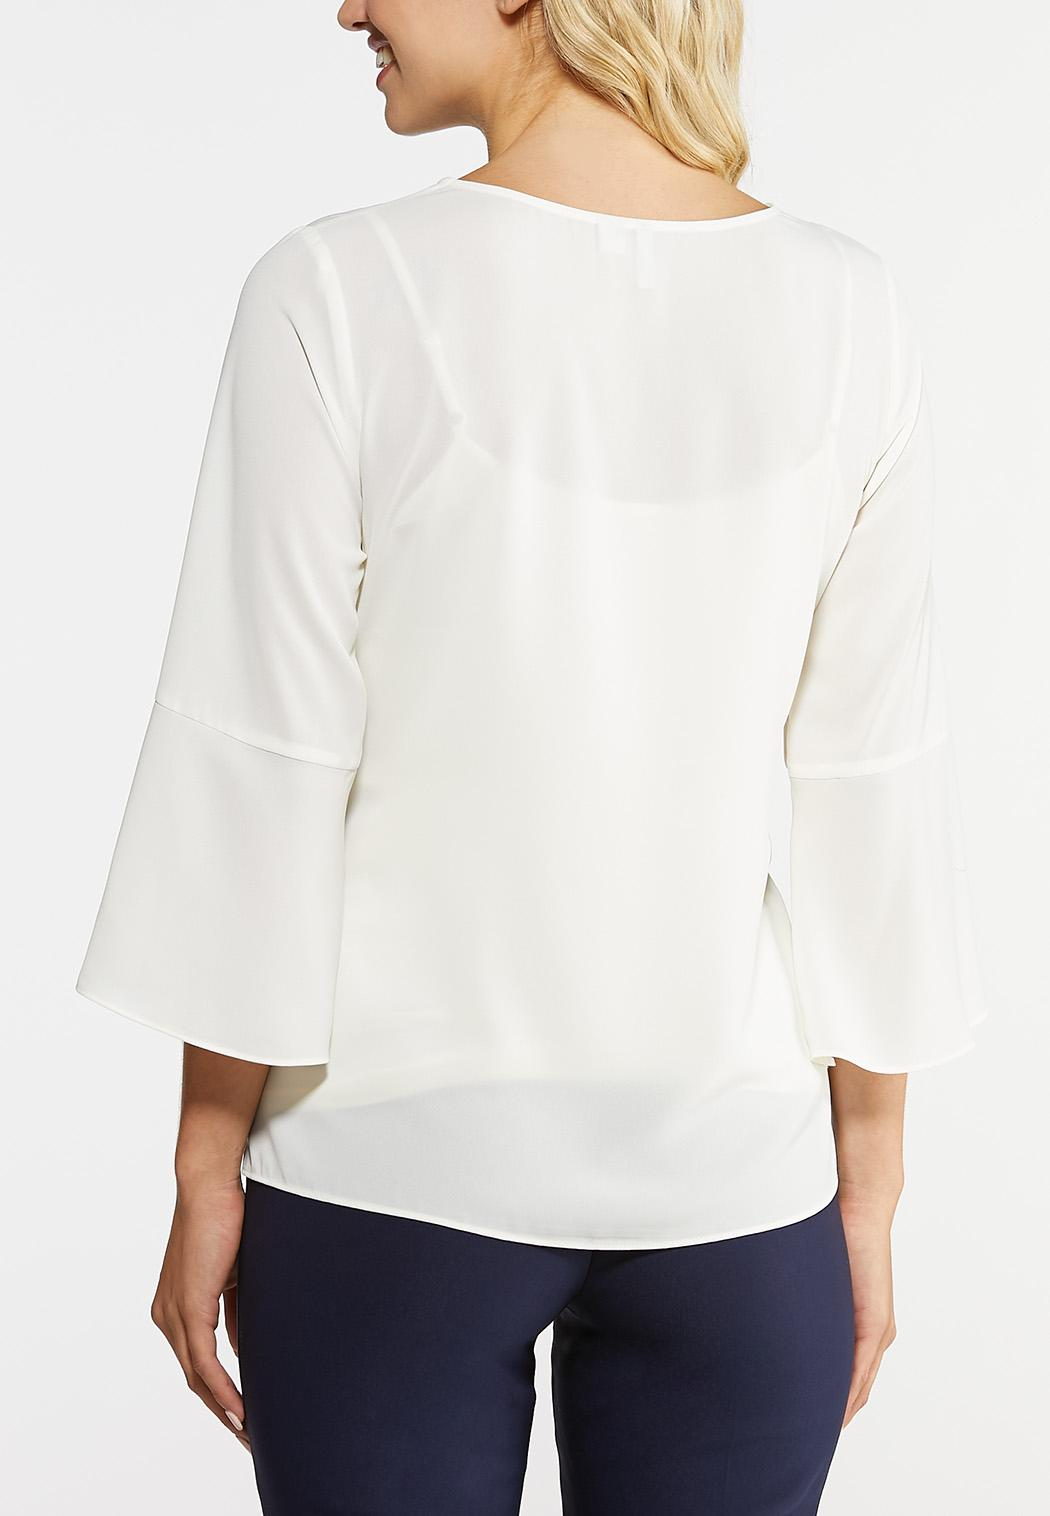 Plus Size Solid Tie Front Top (Item #43956952)